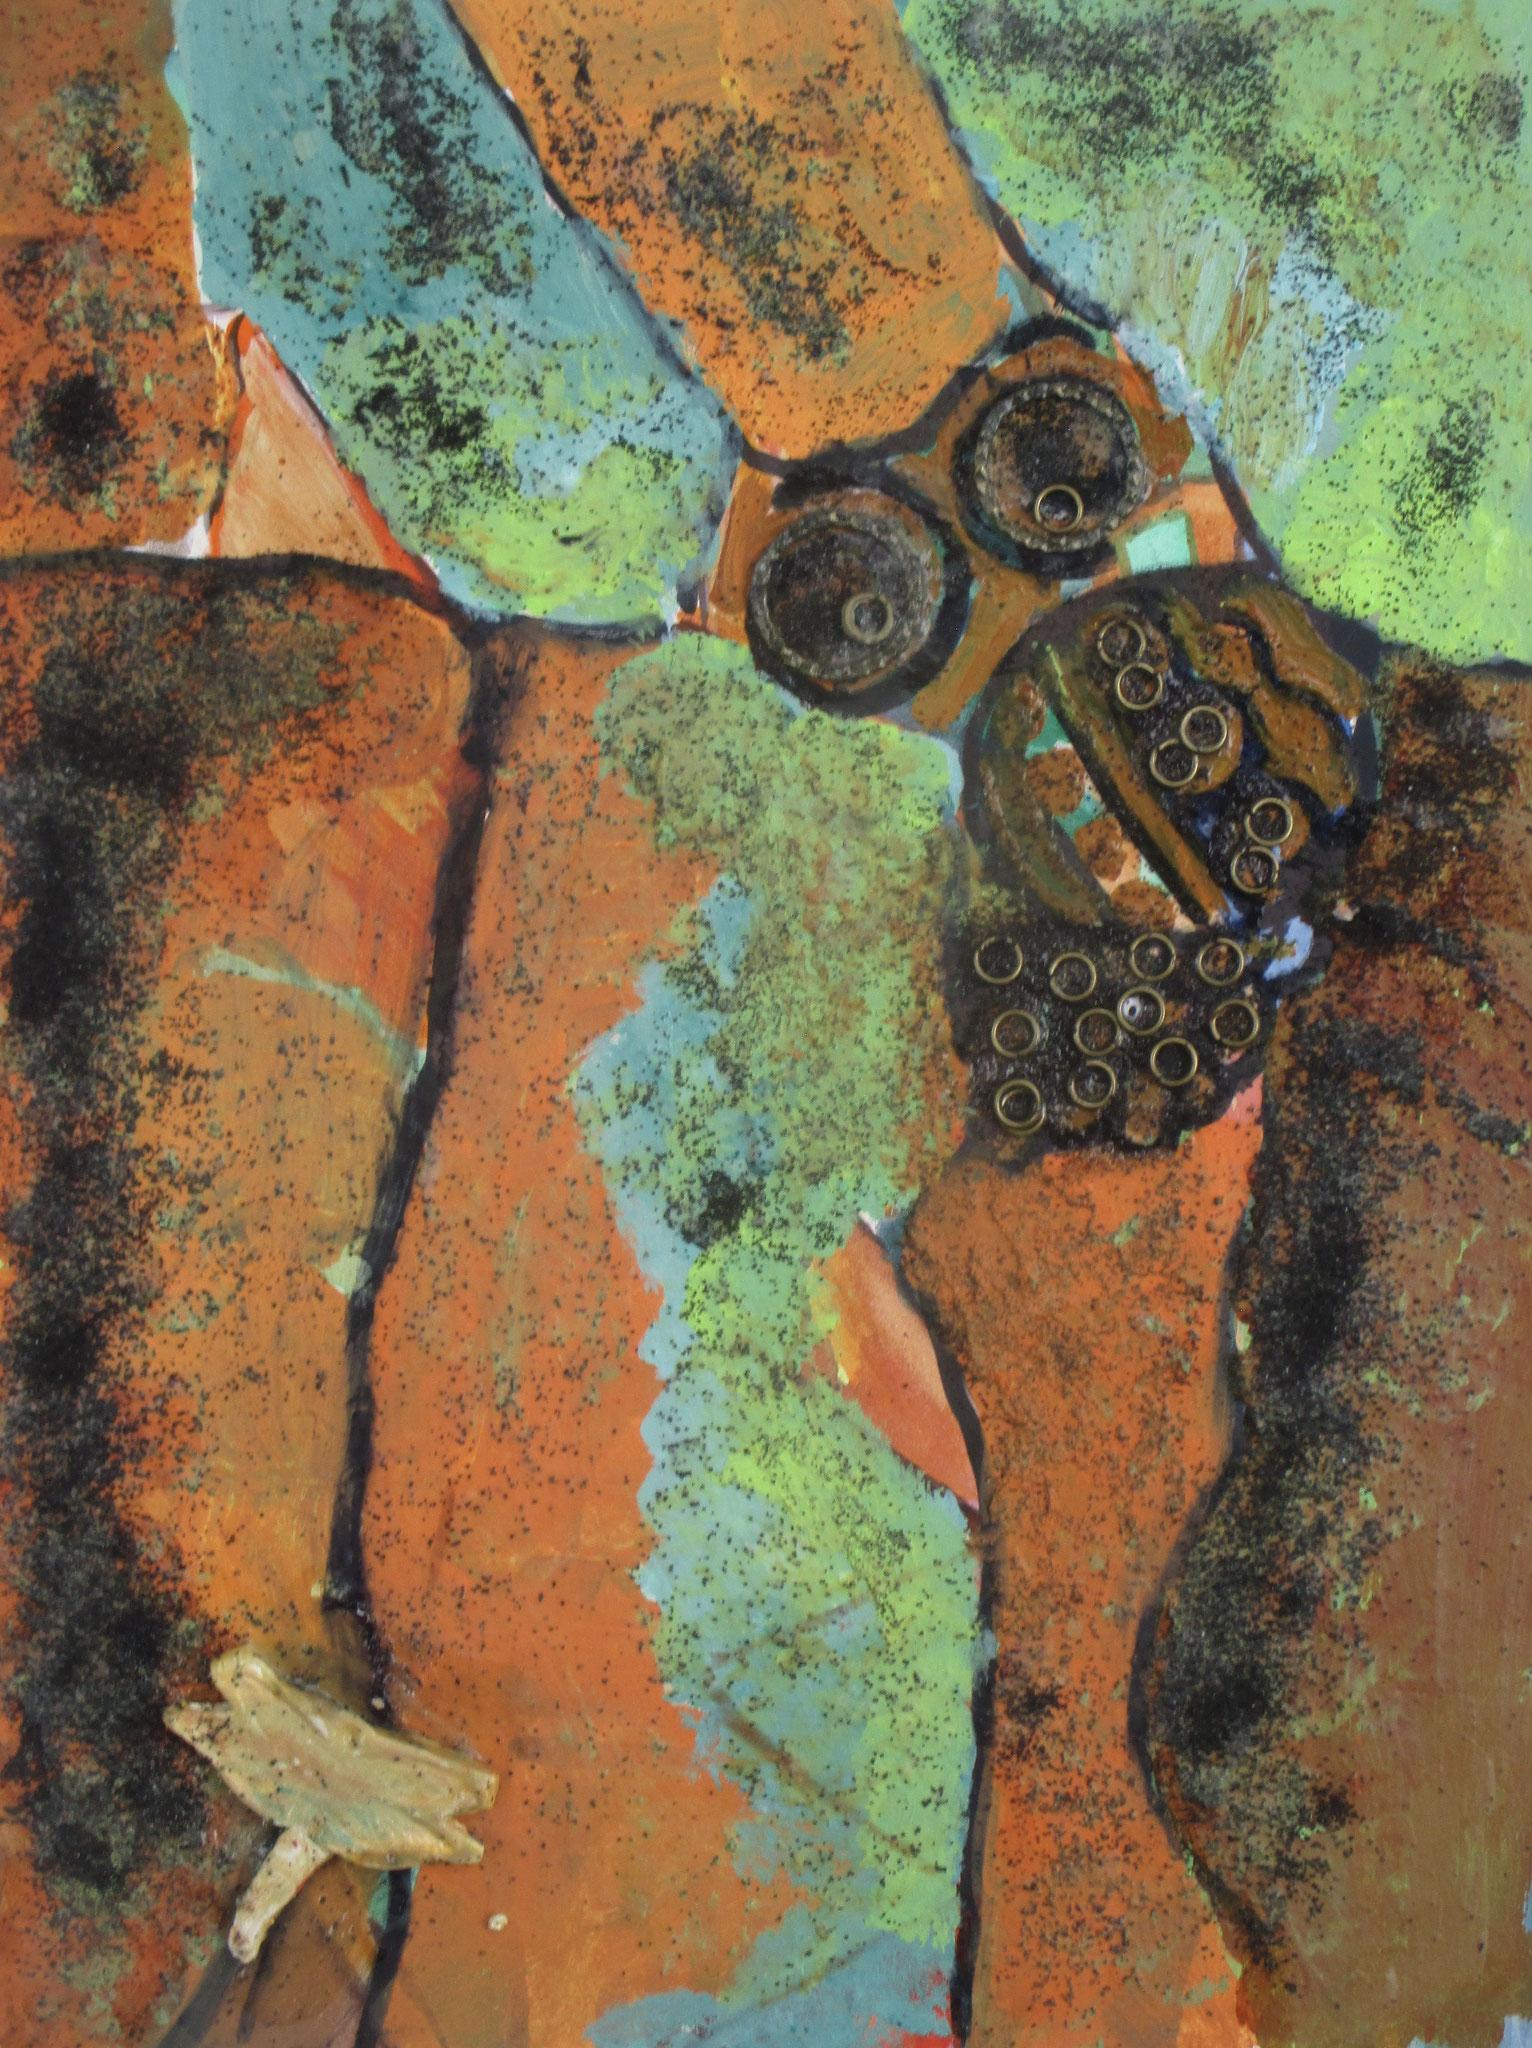 Dragonfly Rock, acrylic, metal, clay on board, 9 x 12